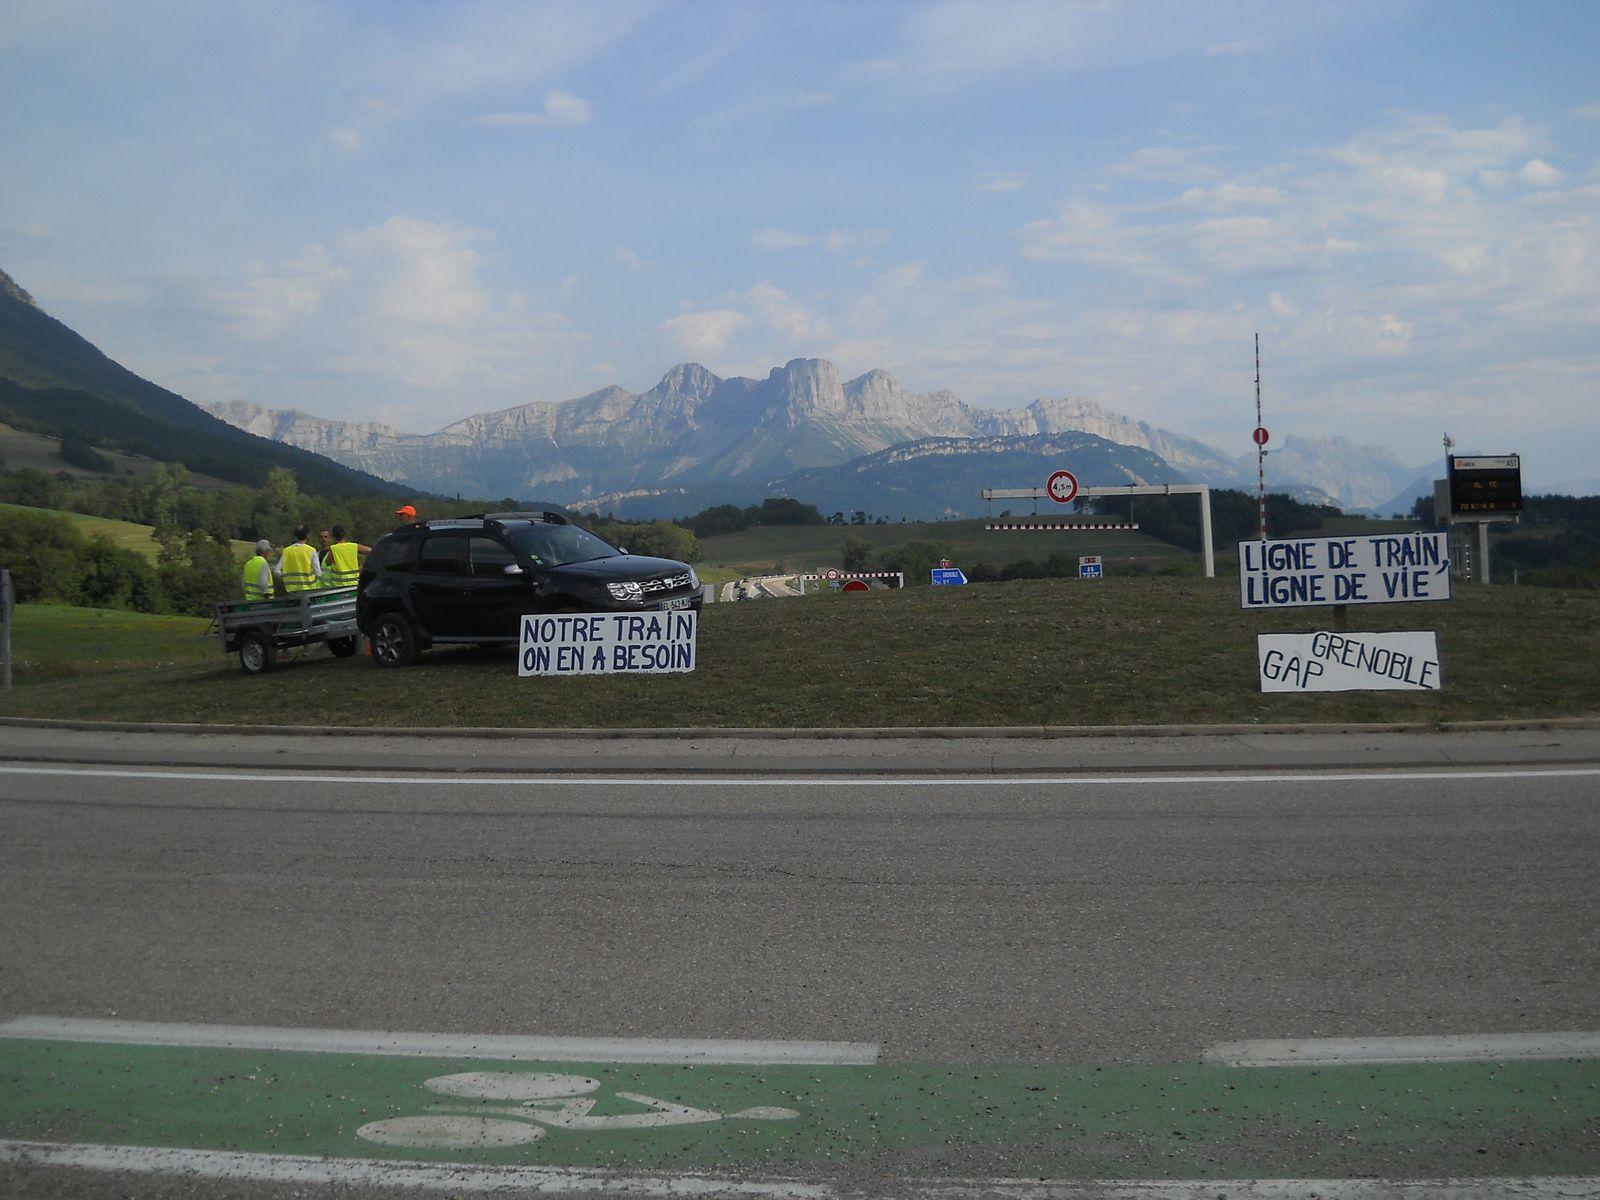 Grenoble-Gap